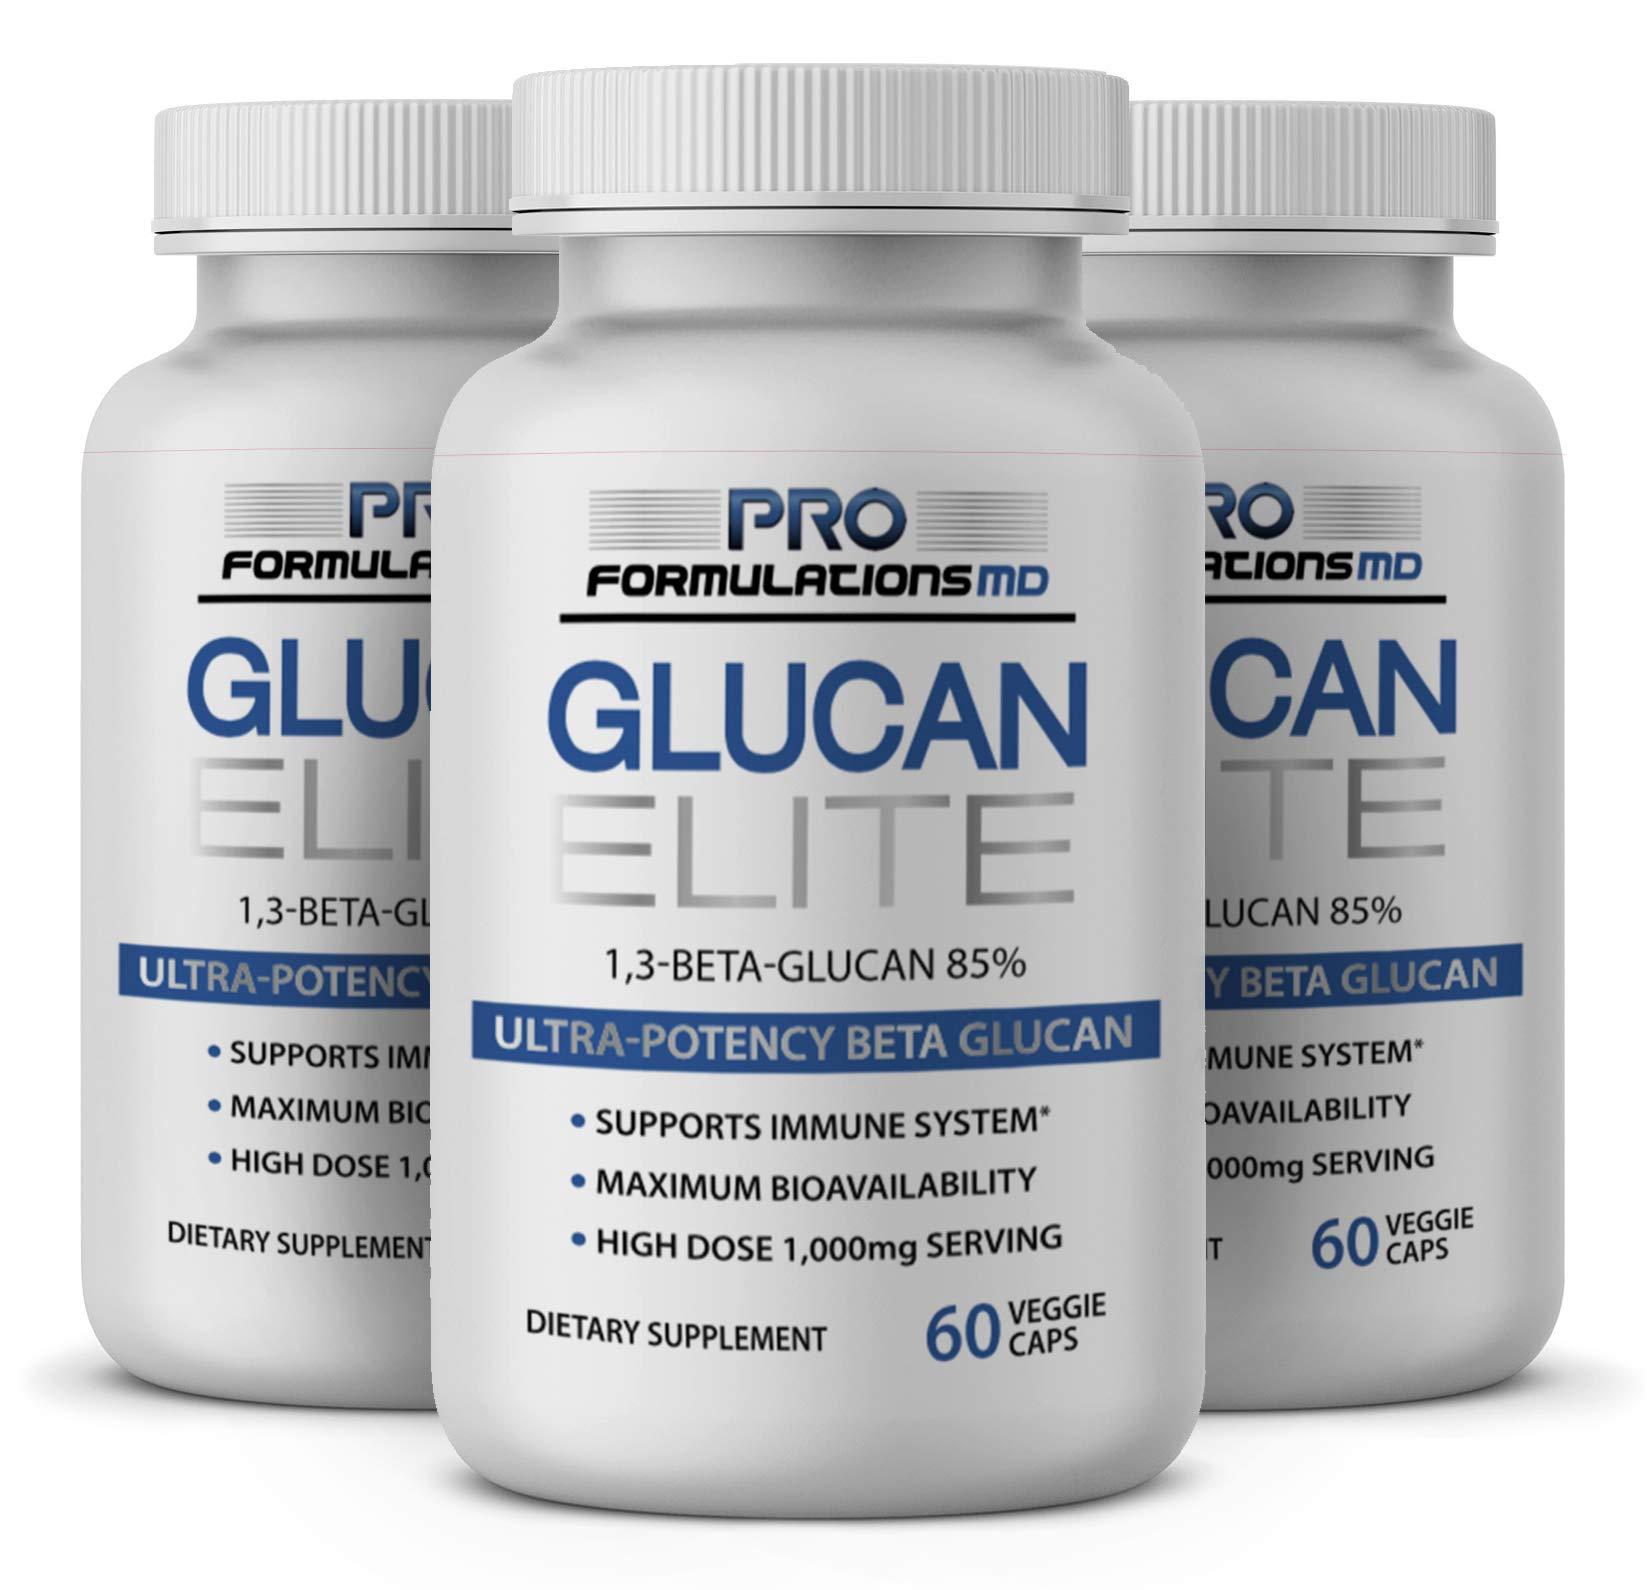 Glucan Elite – 85% Beta 1,3D Glucan 500mg - 60 vcaps | 85% Minimum Active 1,3 Linkage Ultra-Potency Beta Glucan – Highest Bioavailability with BGF-Immune (Pack of 3)